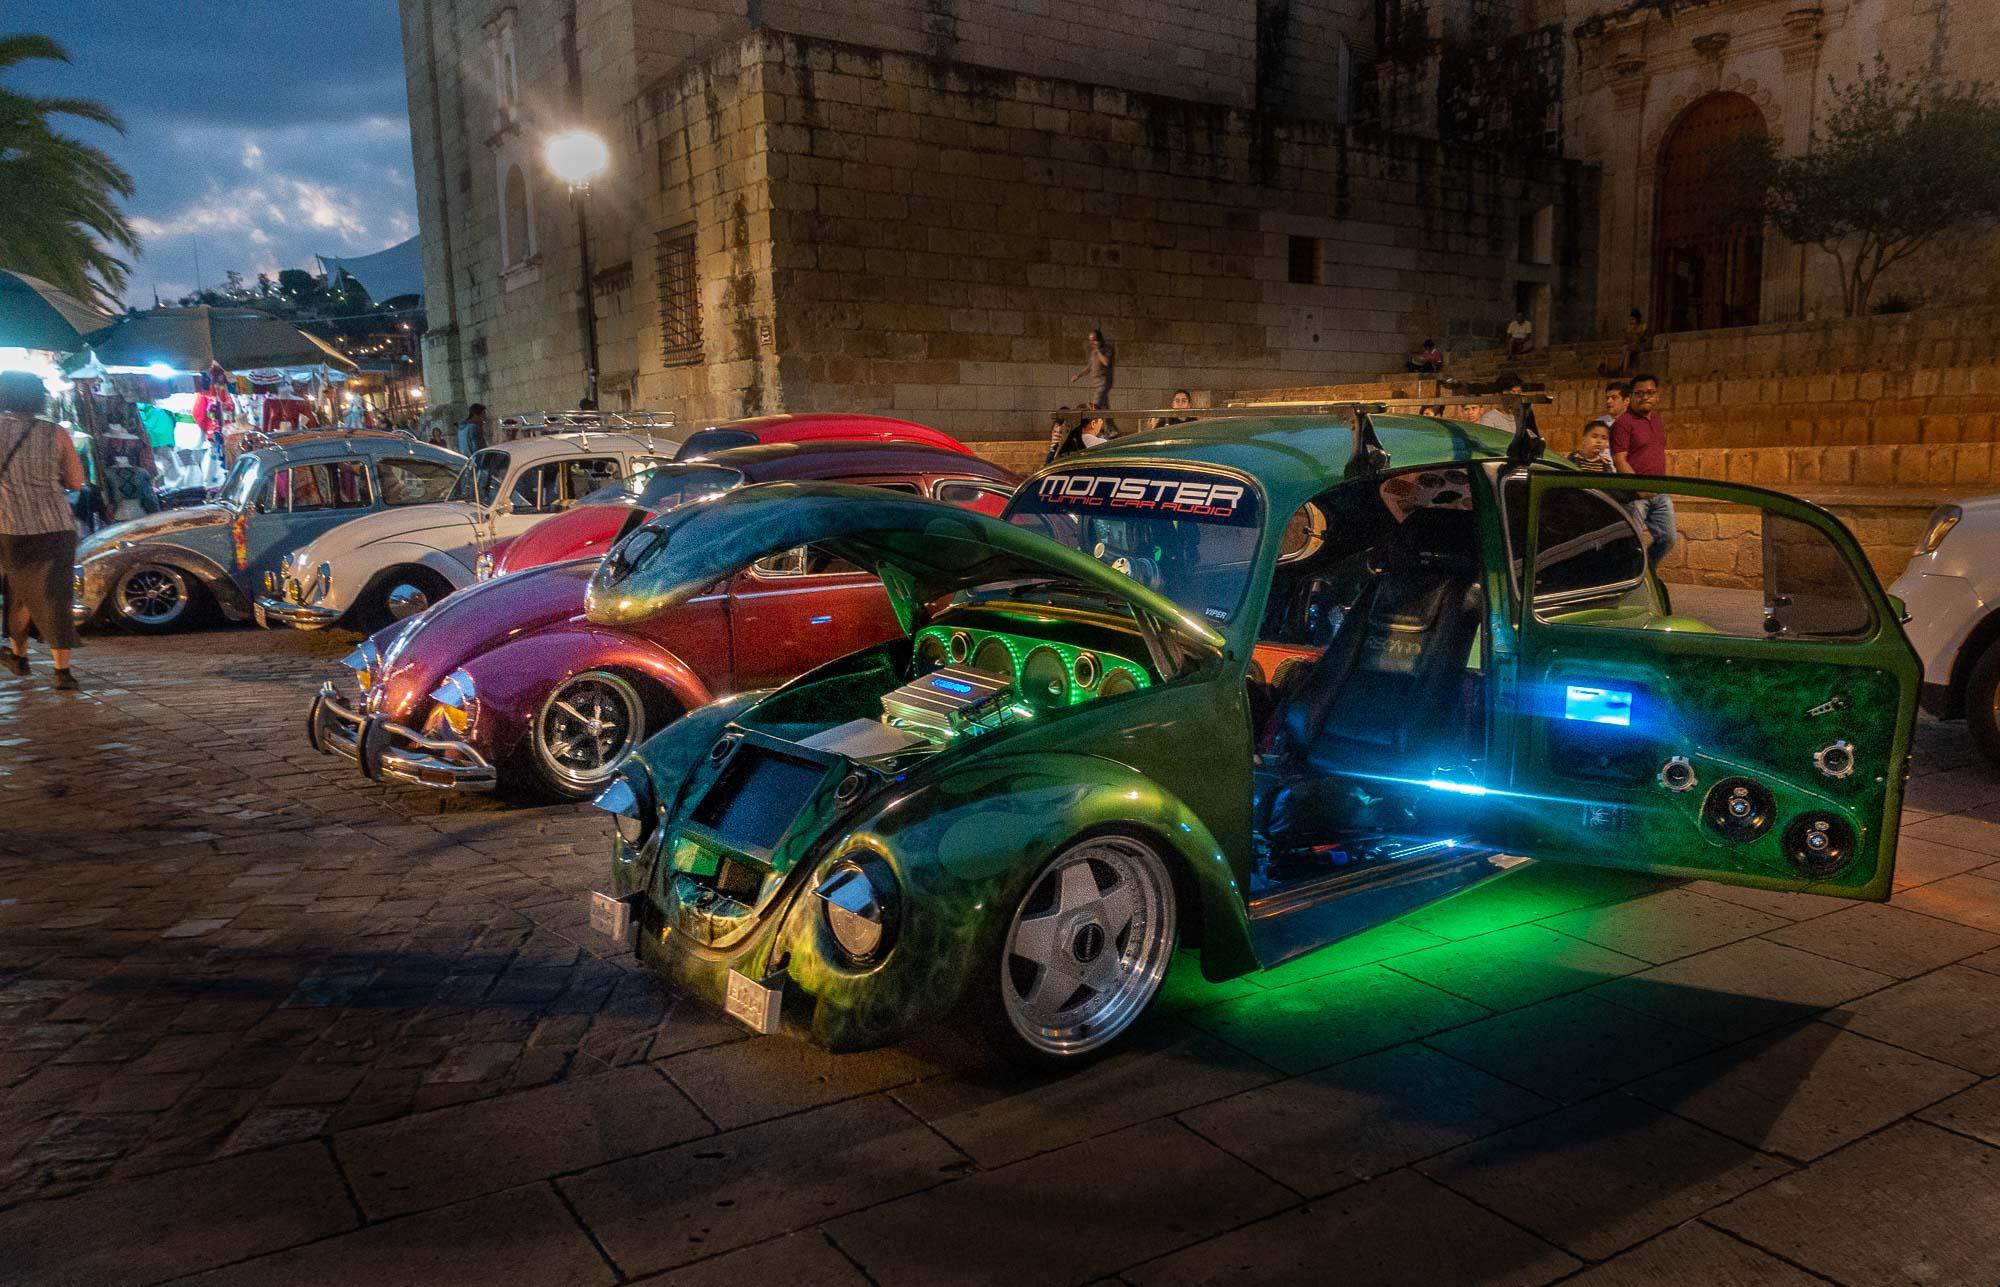 Impromptu modified VW show